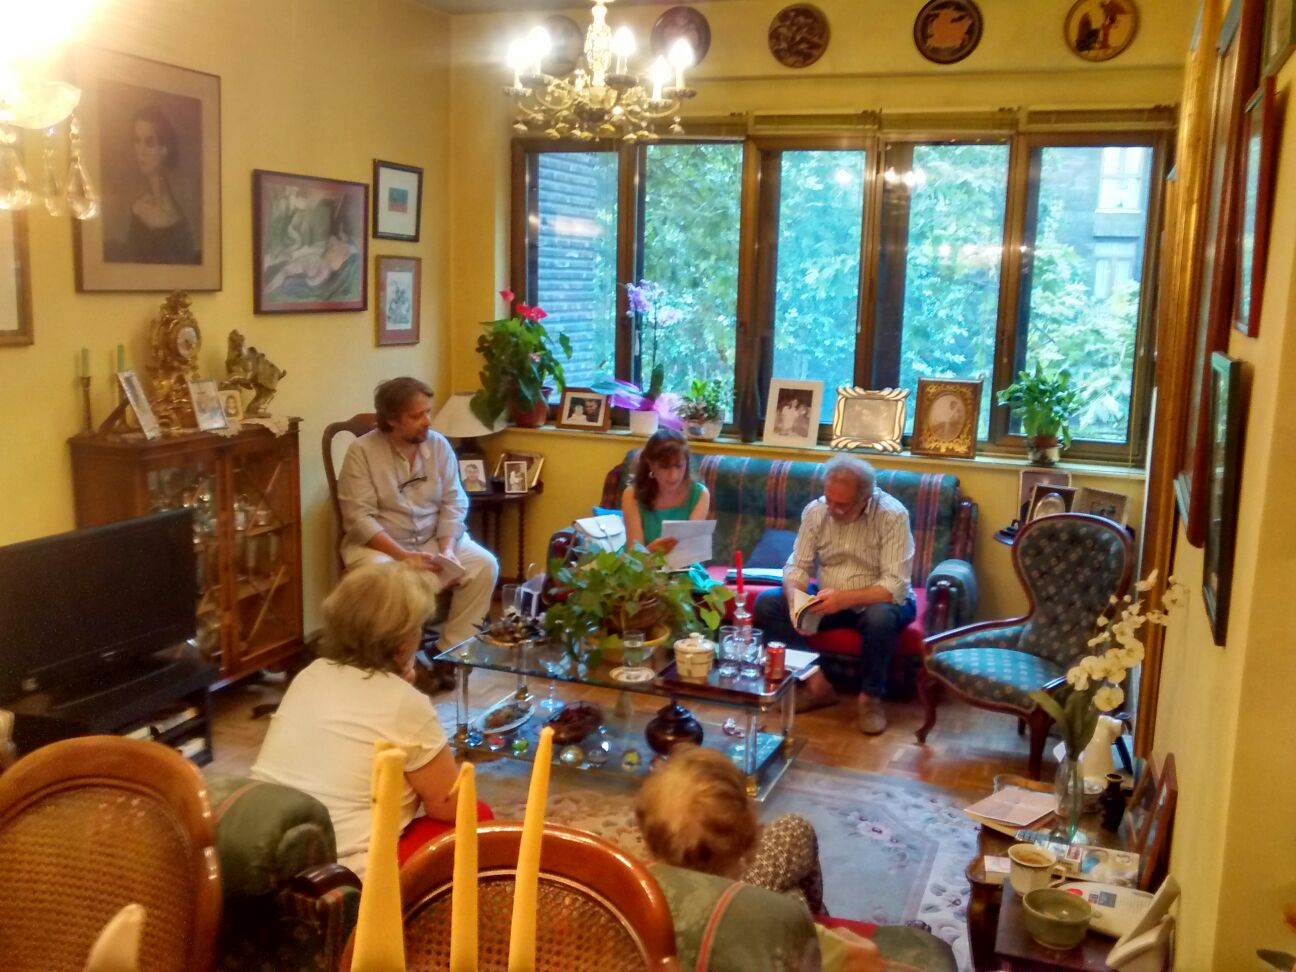 Visita poética a Elvira Daudet